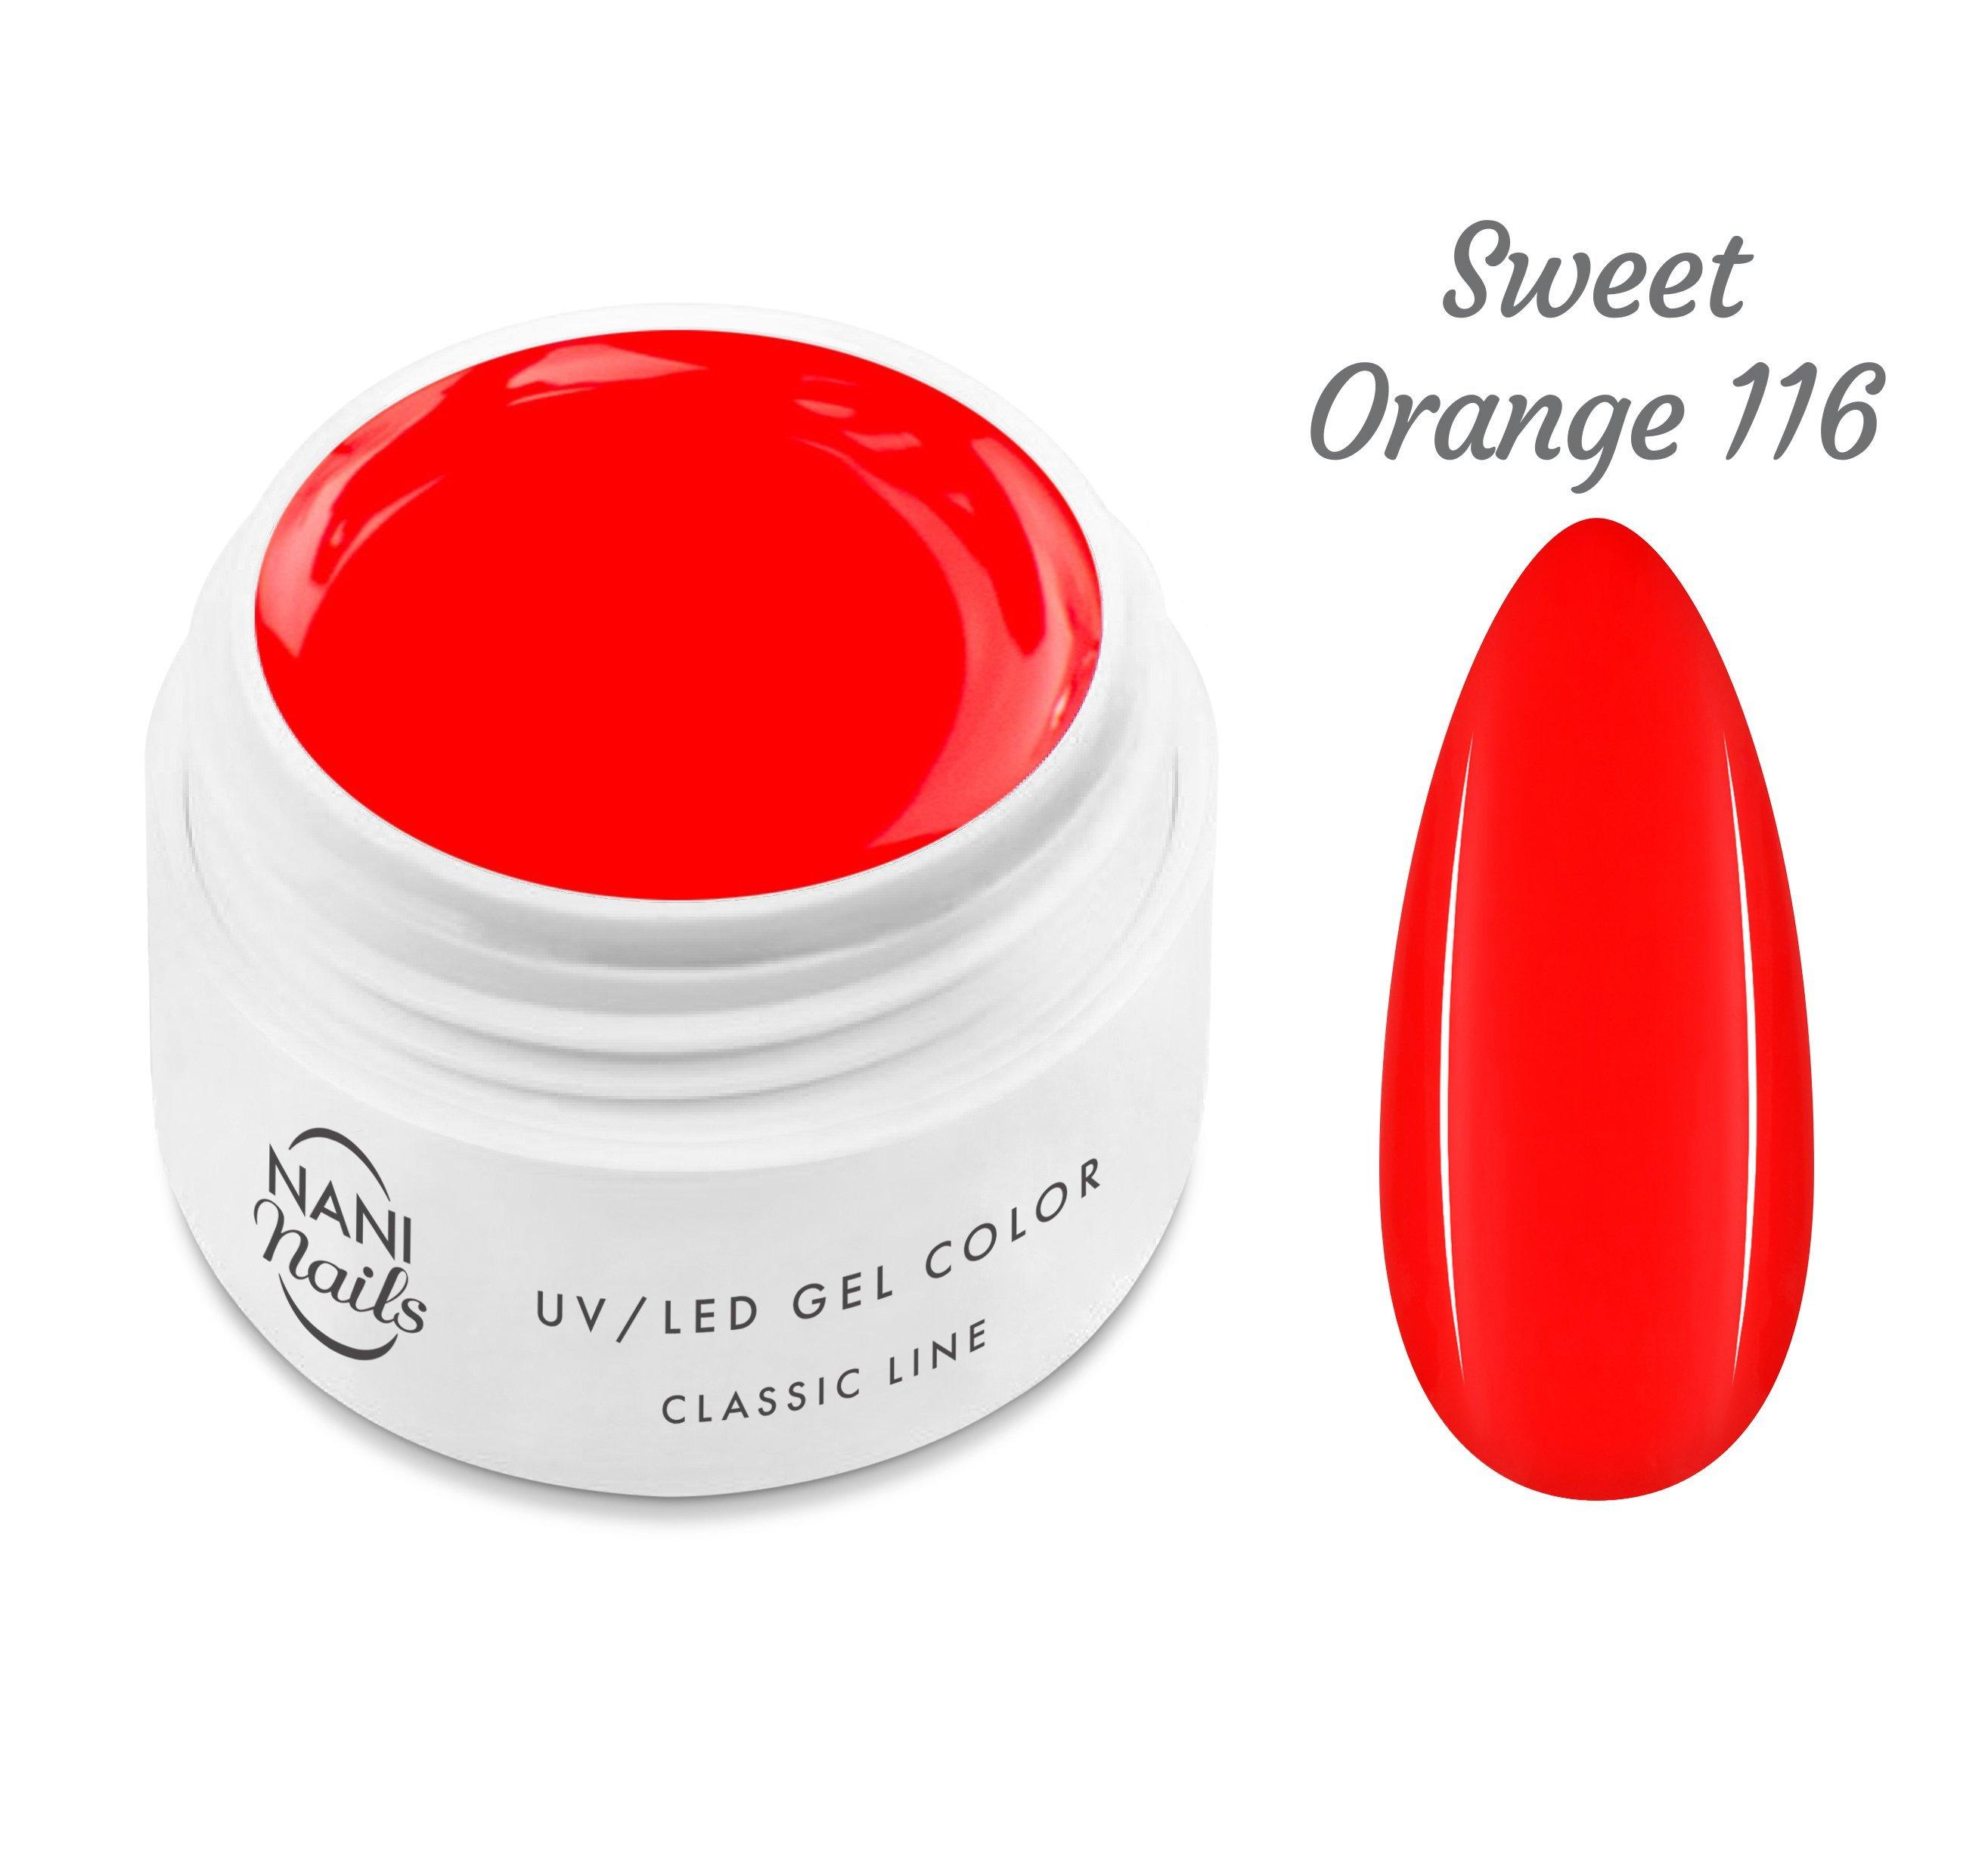 NANI UV gél Classic Line 5 ml - Sweet Orange